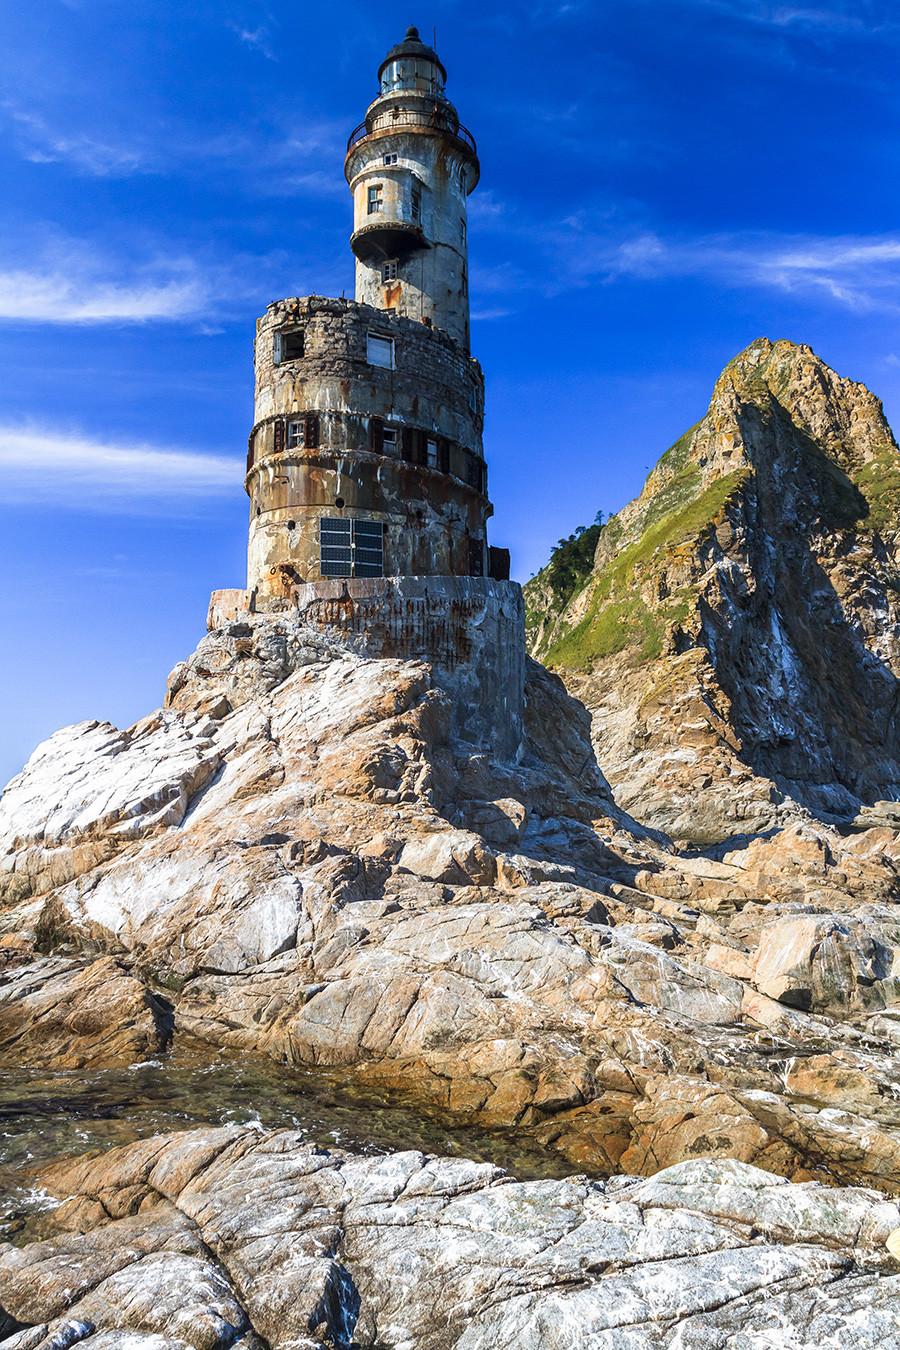 Old Lighthouse, Aniva Cape, Sakhalin Island, Russia.